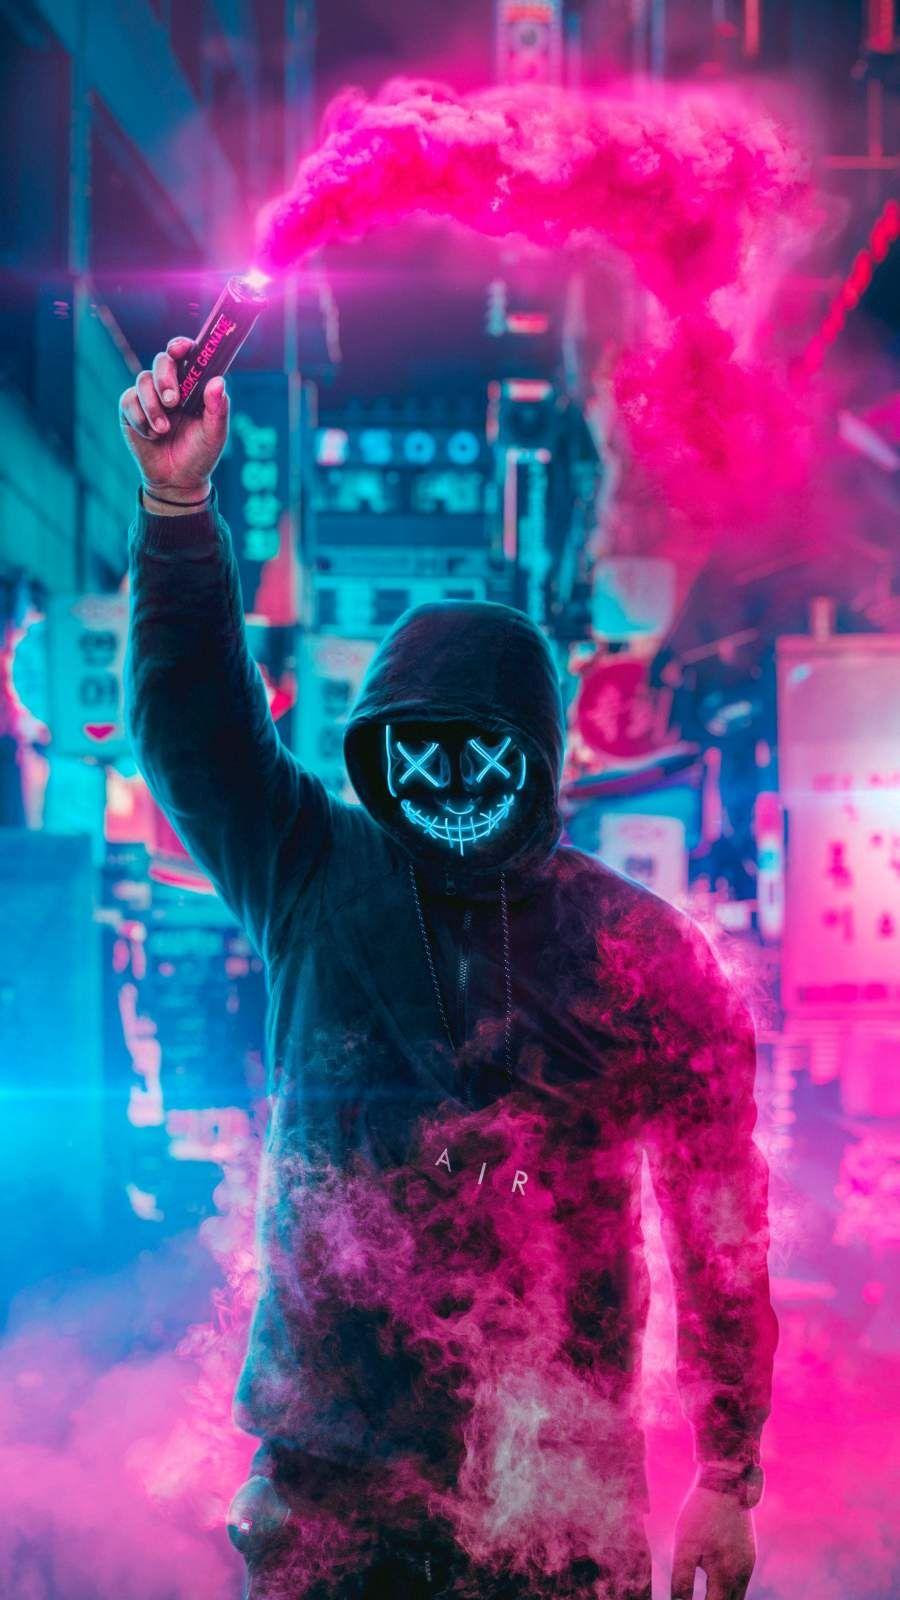 Smoke Grenade Neon Mask Guy Iphone Wallpaper Smoke Wallpaper Joker Hd Wallpaper Graffiti Wallpaper